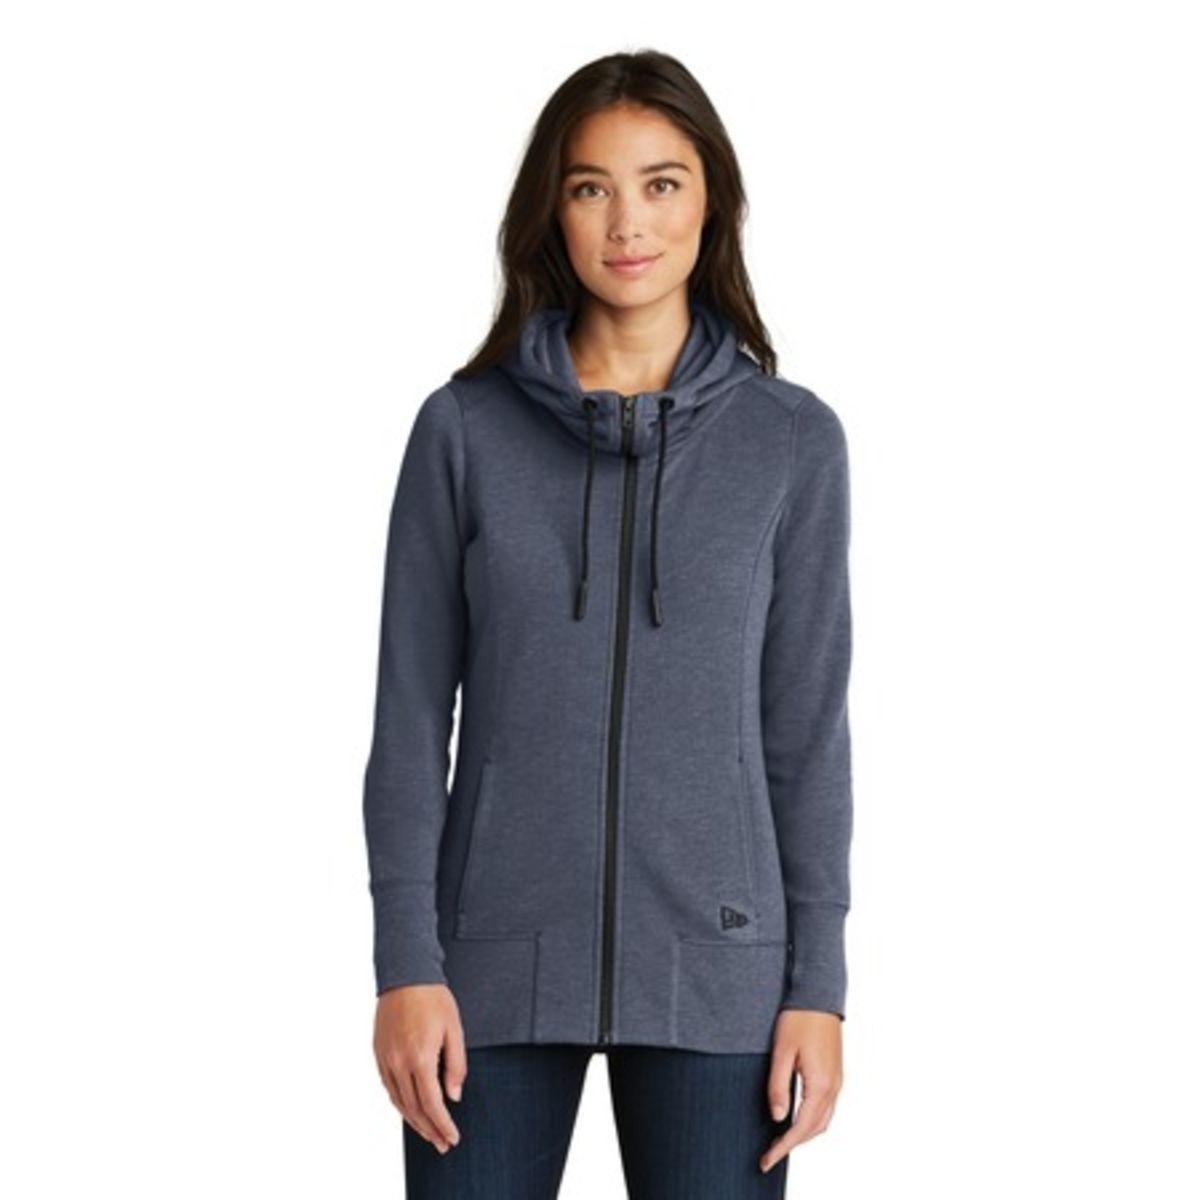 Promotional New Era Ladies Tri-blend Fleece Full-zip